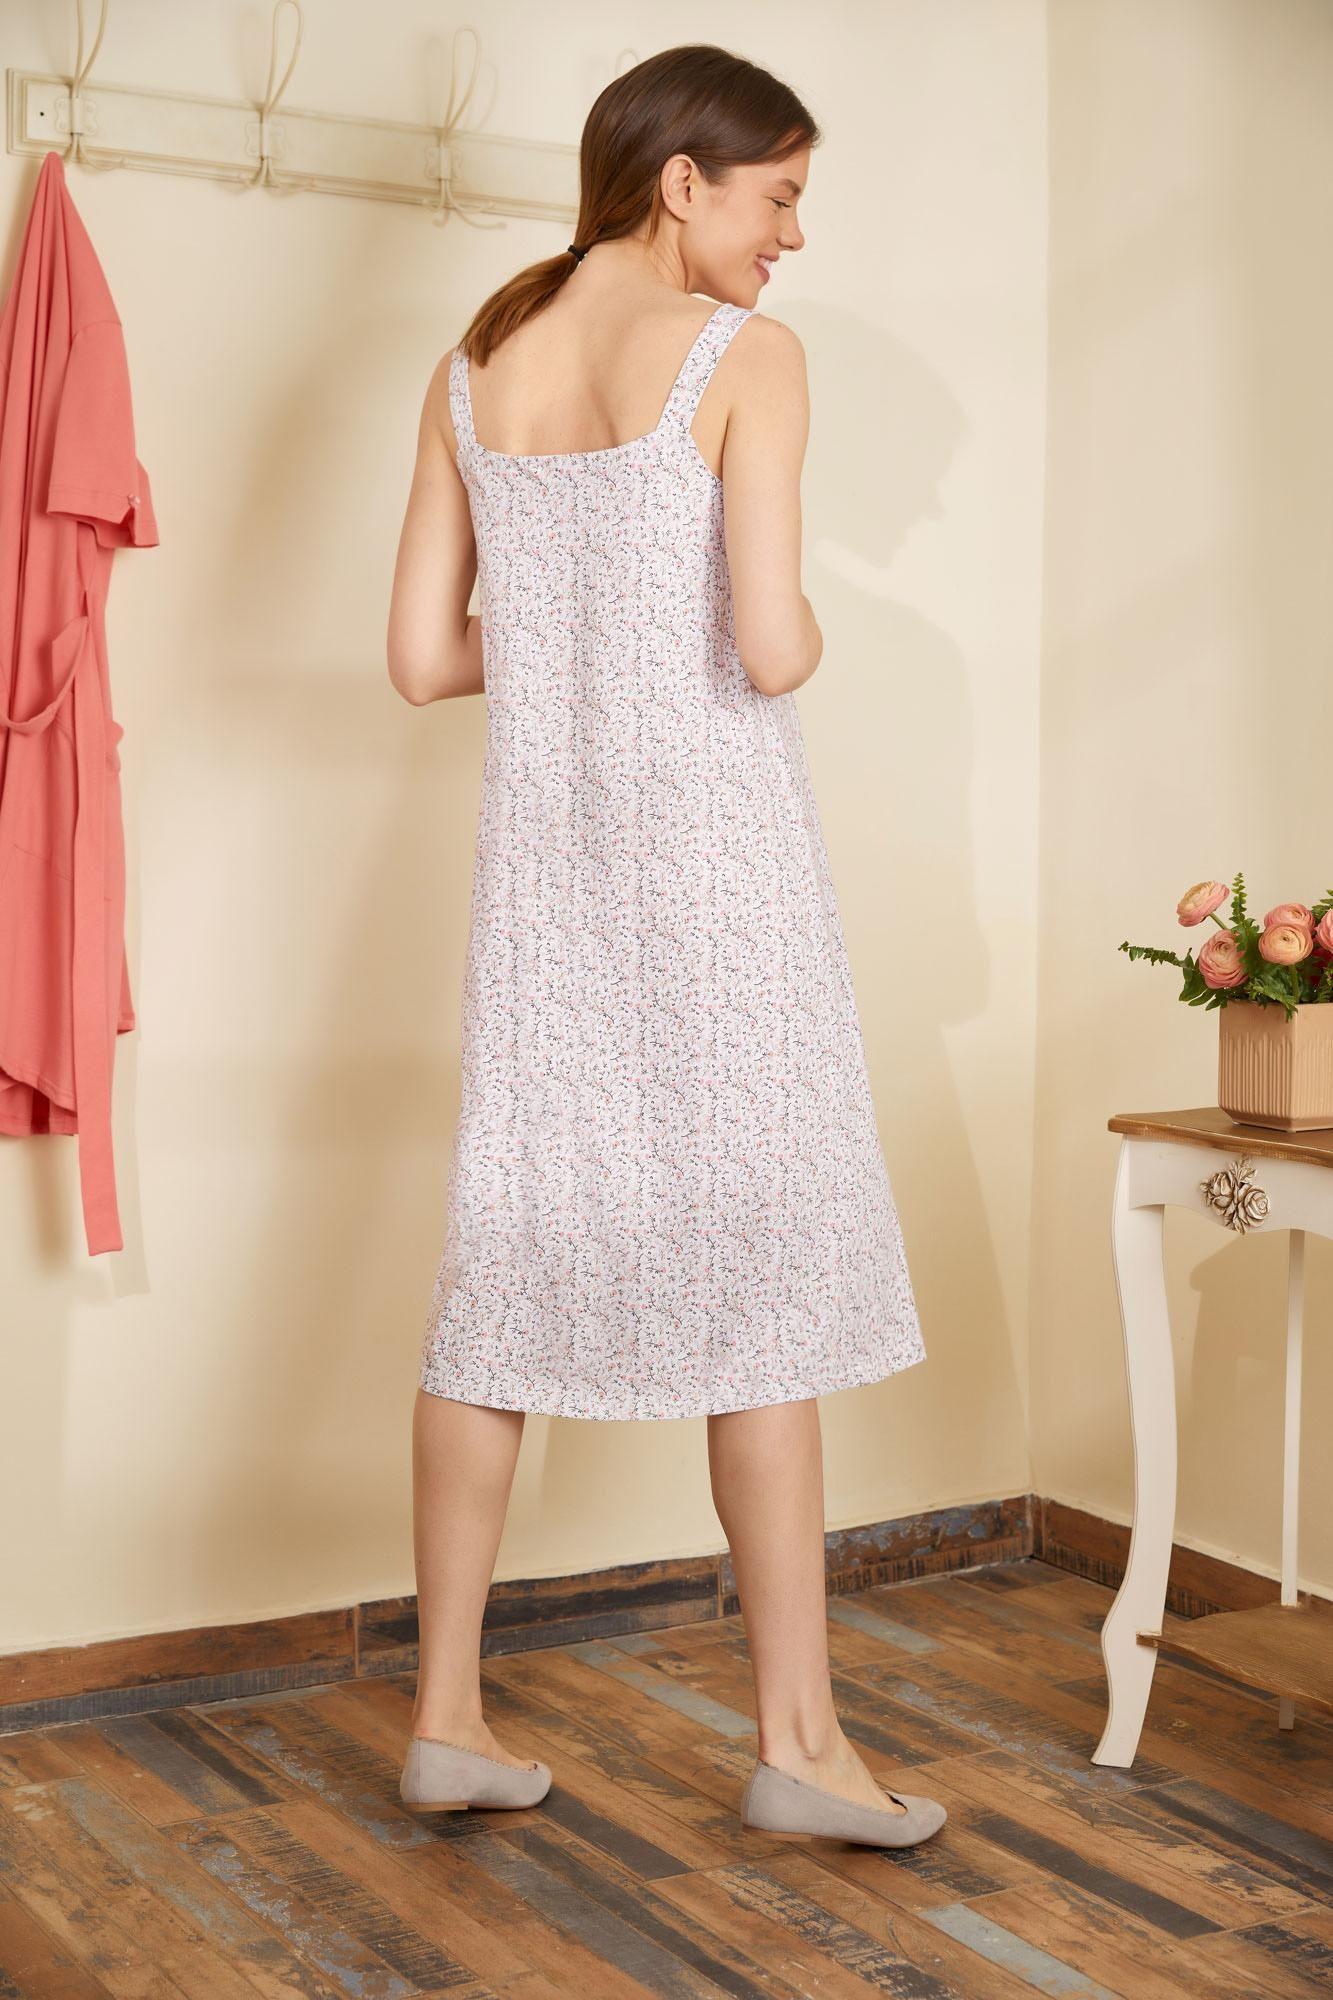 Sleeveless Printed Nightgown